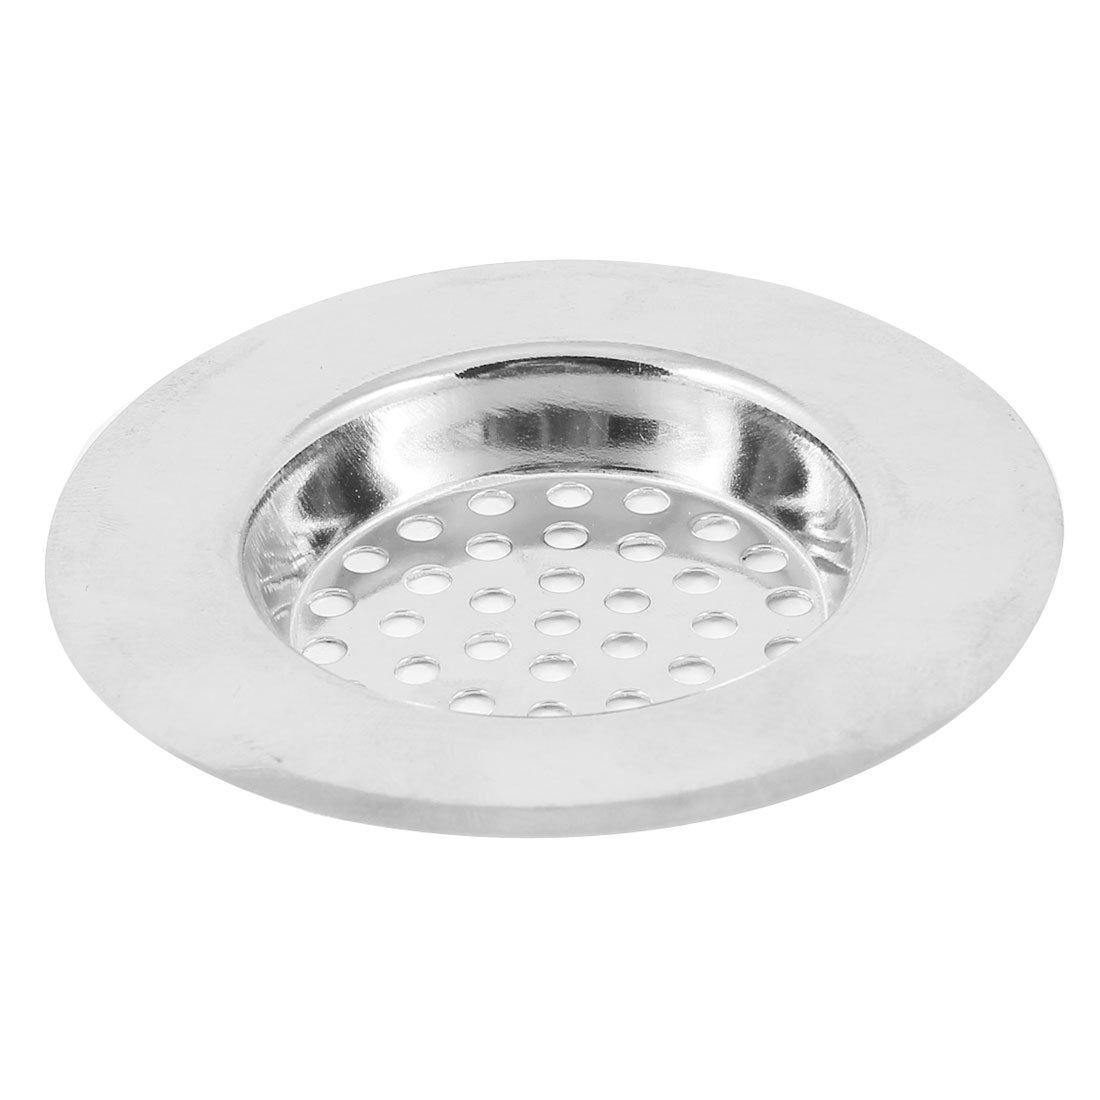 7 1cm Dia Stainless Steel Water Drain Plug Sink Basin